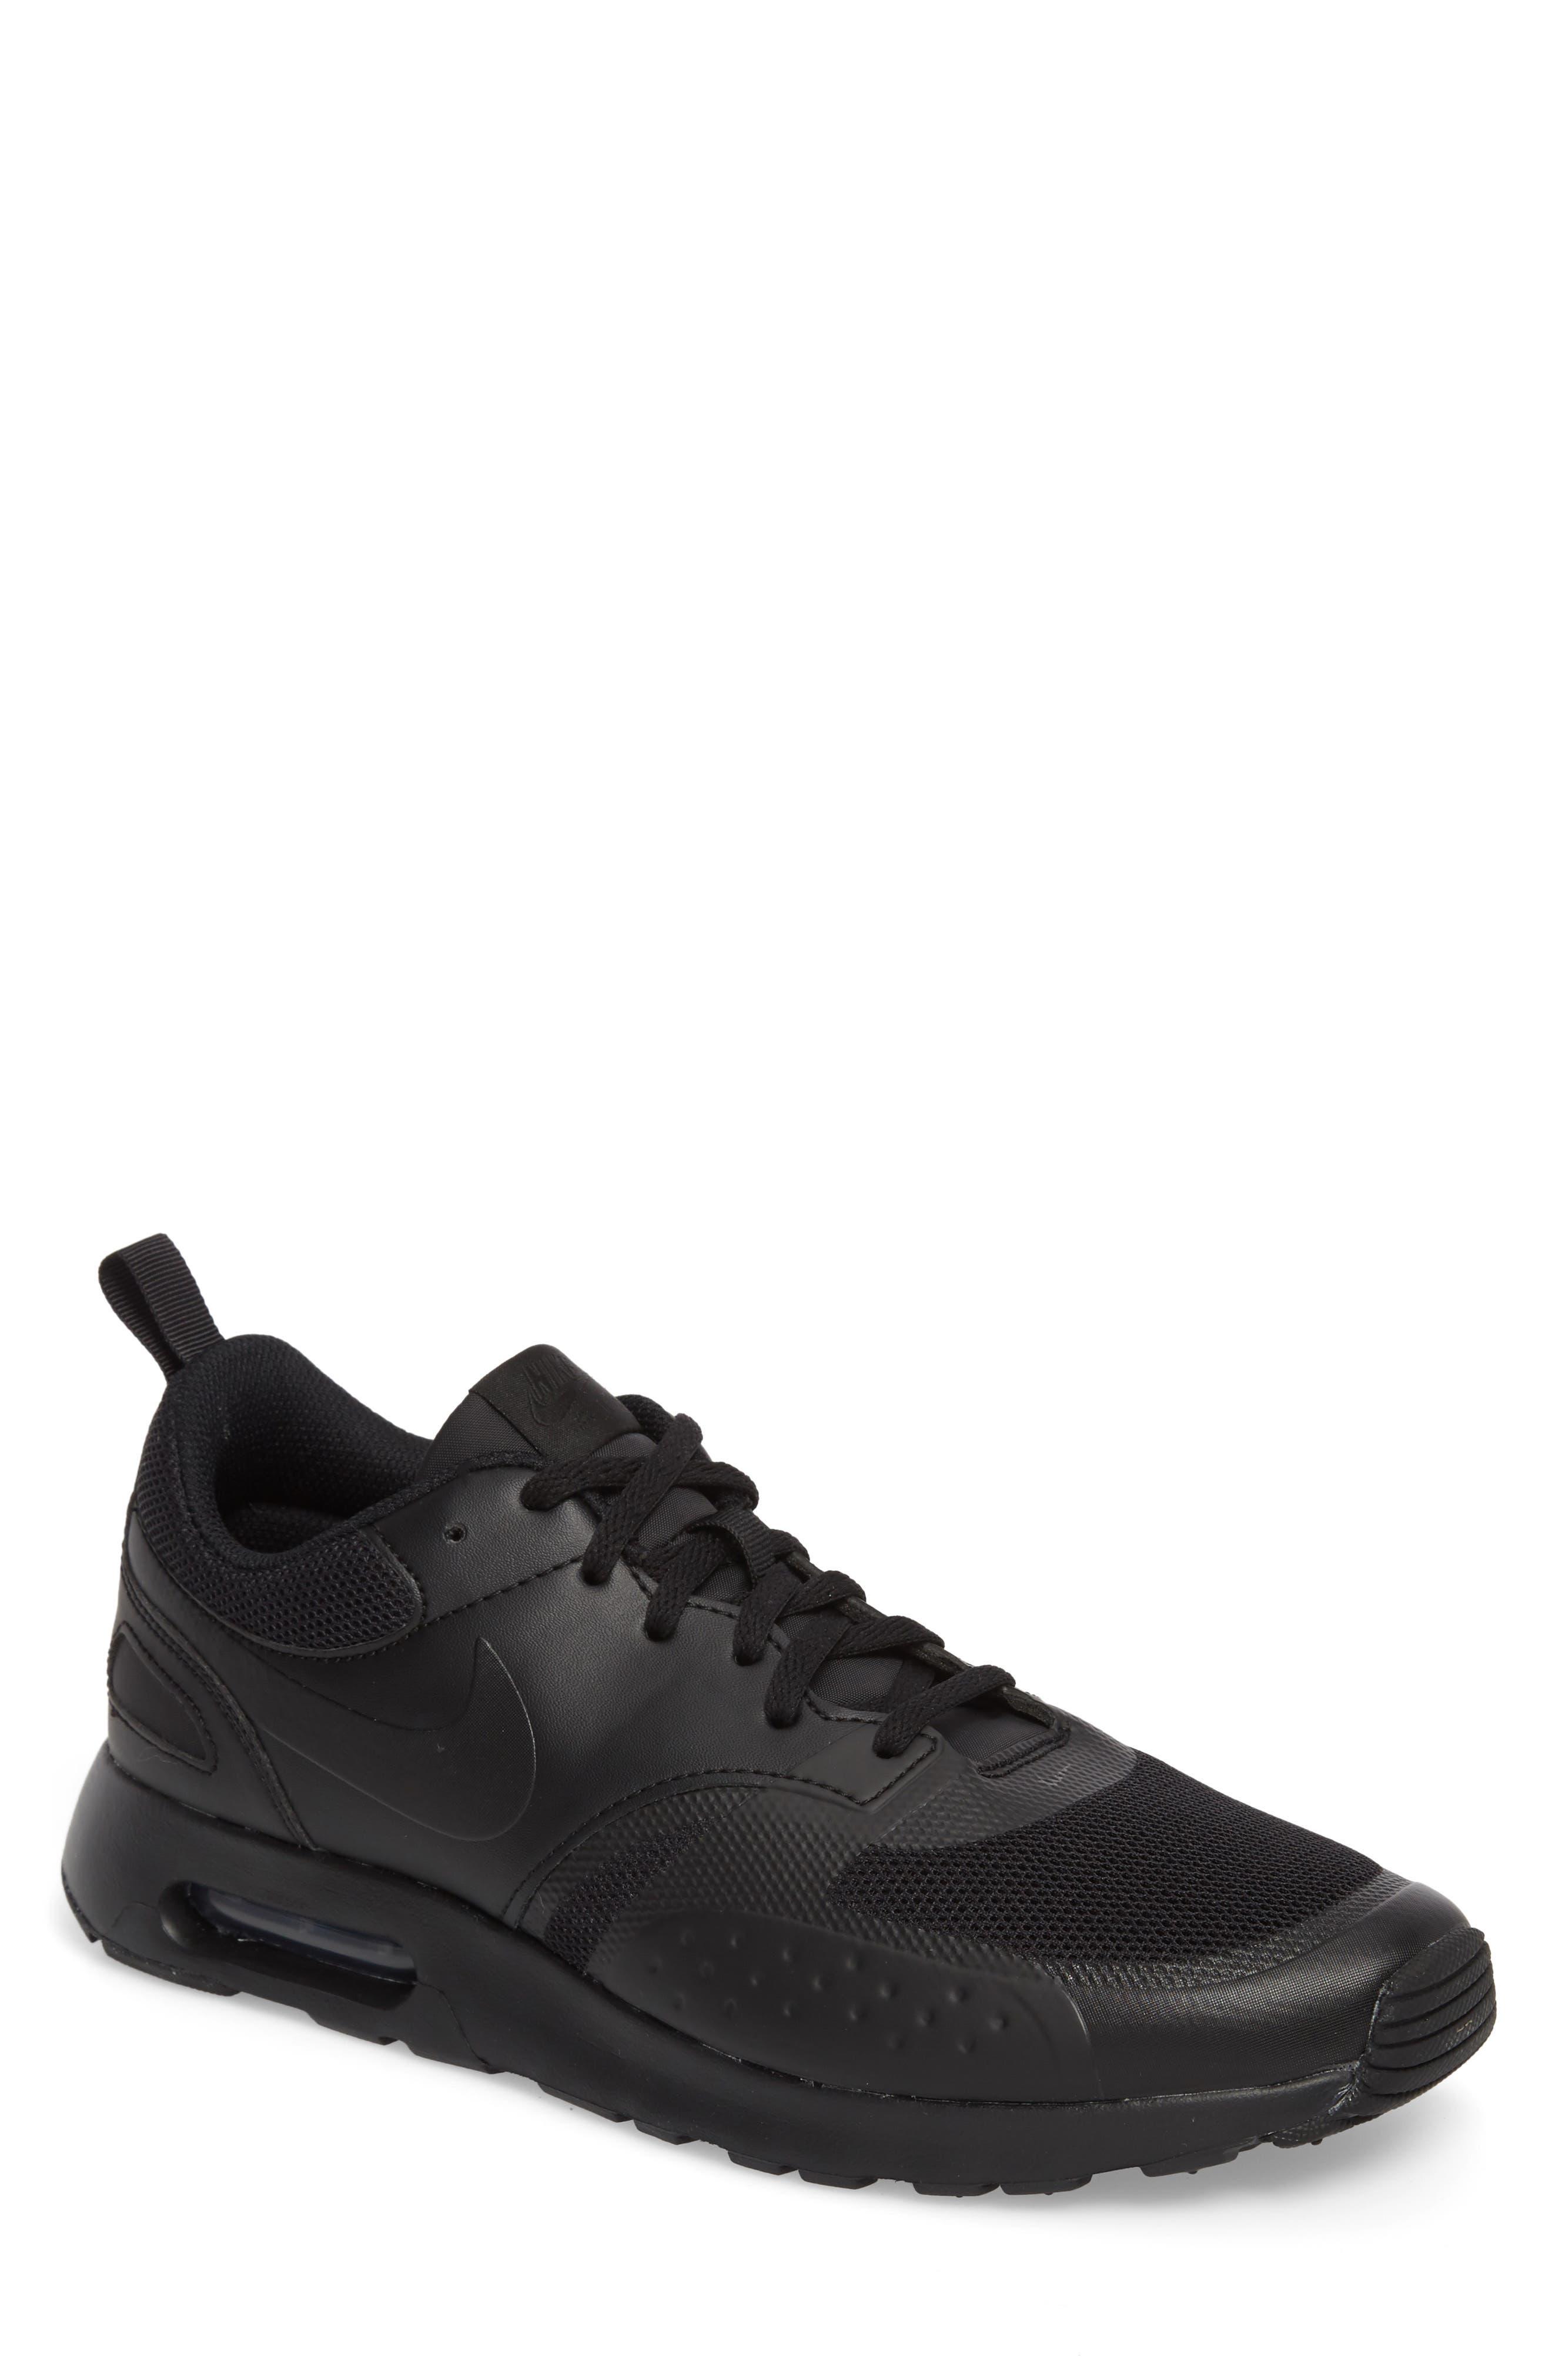 Air Max Vision Sneaker,                             Main thumbnail 1, color,                             BLACK/ BLACK